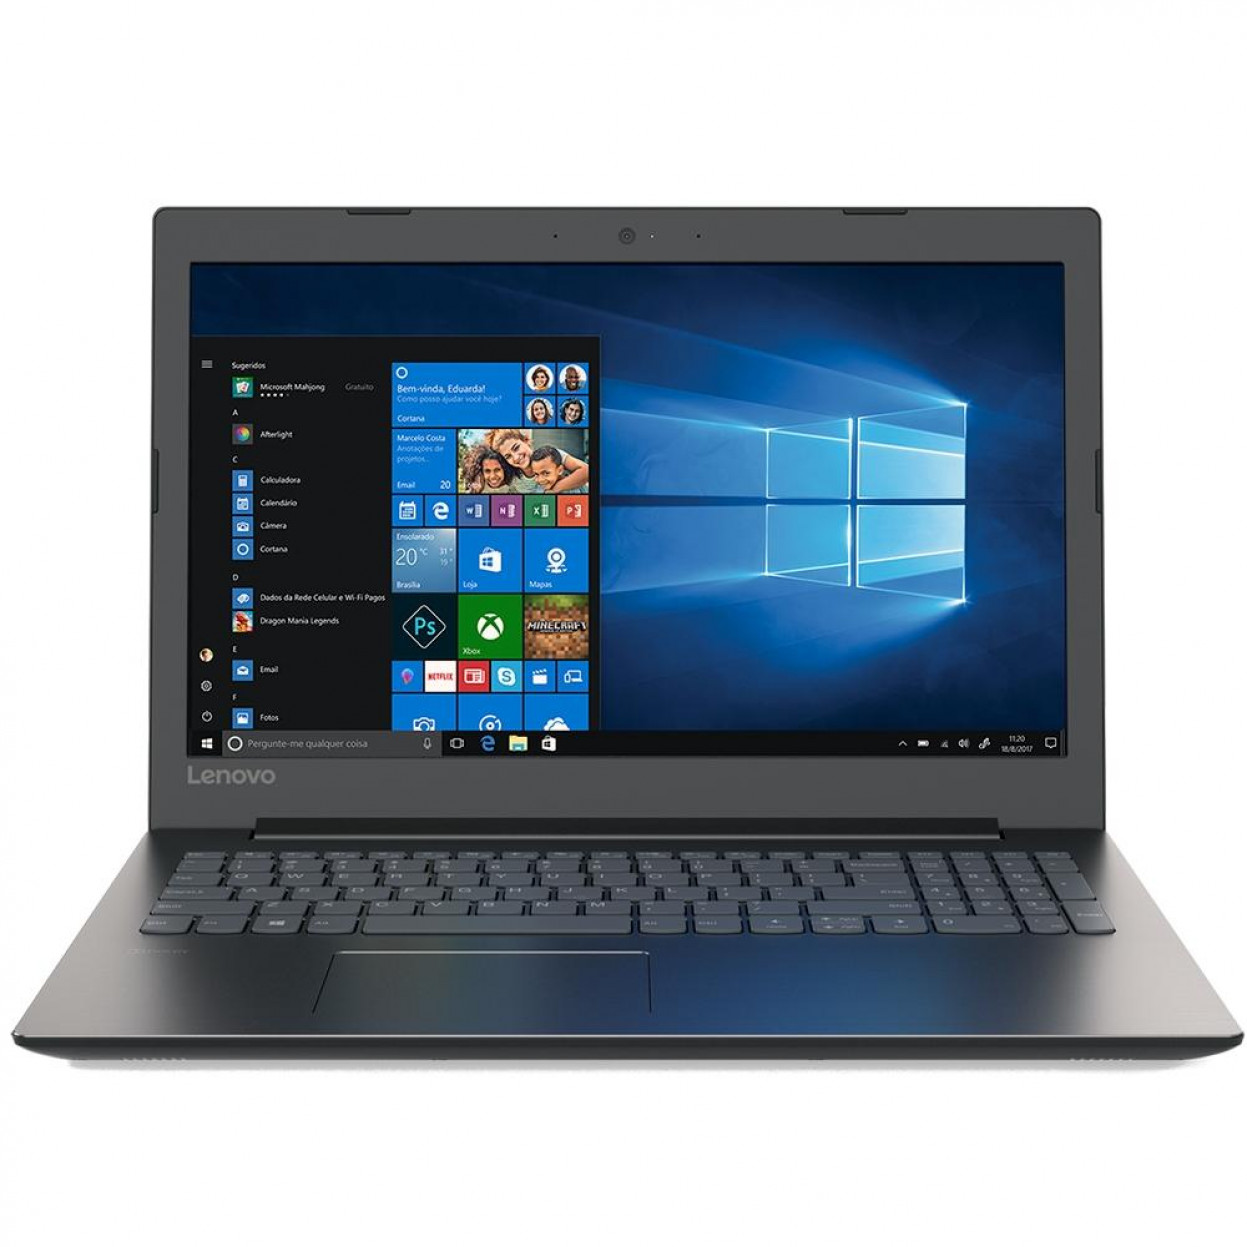 Notebook Lenovo B330 Core I3 7020u Memoria 12gb Hd 500gb Tela 15.6' Hd Windows 10 Home